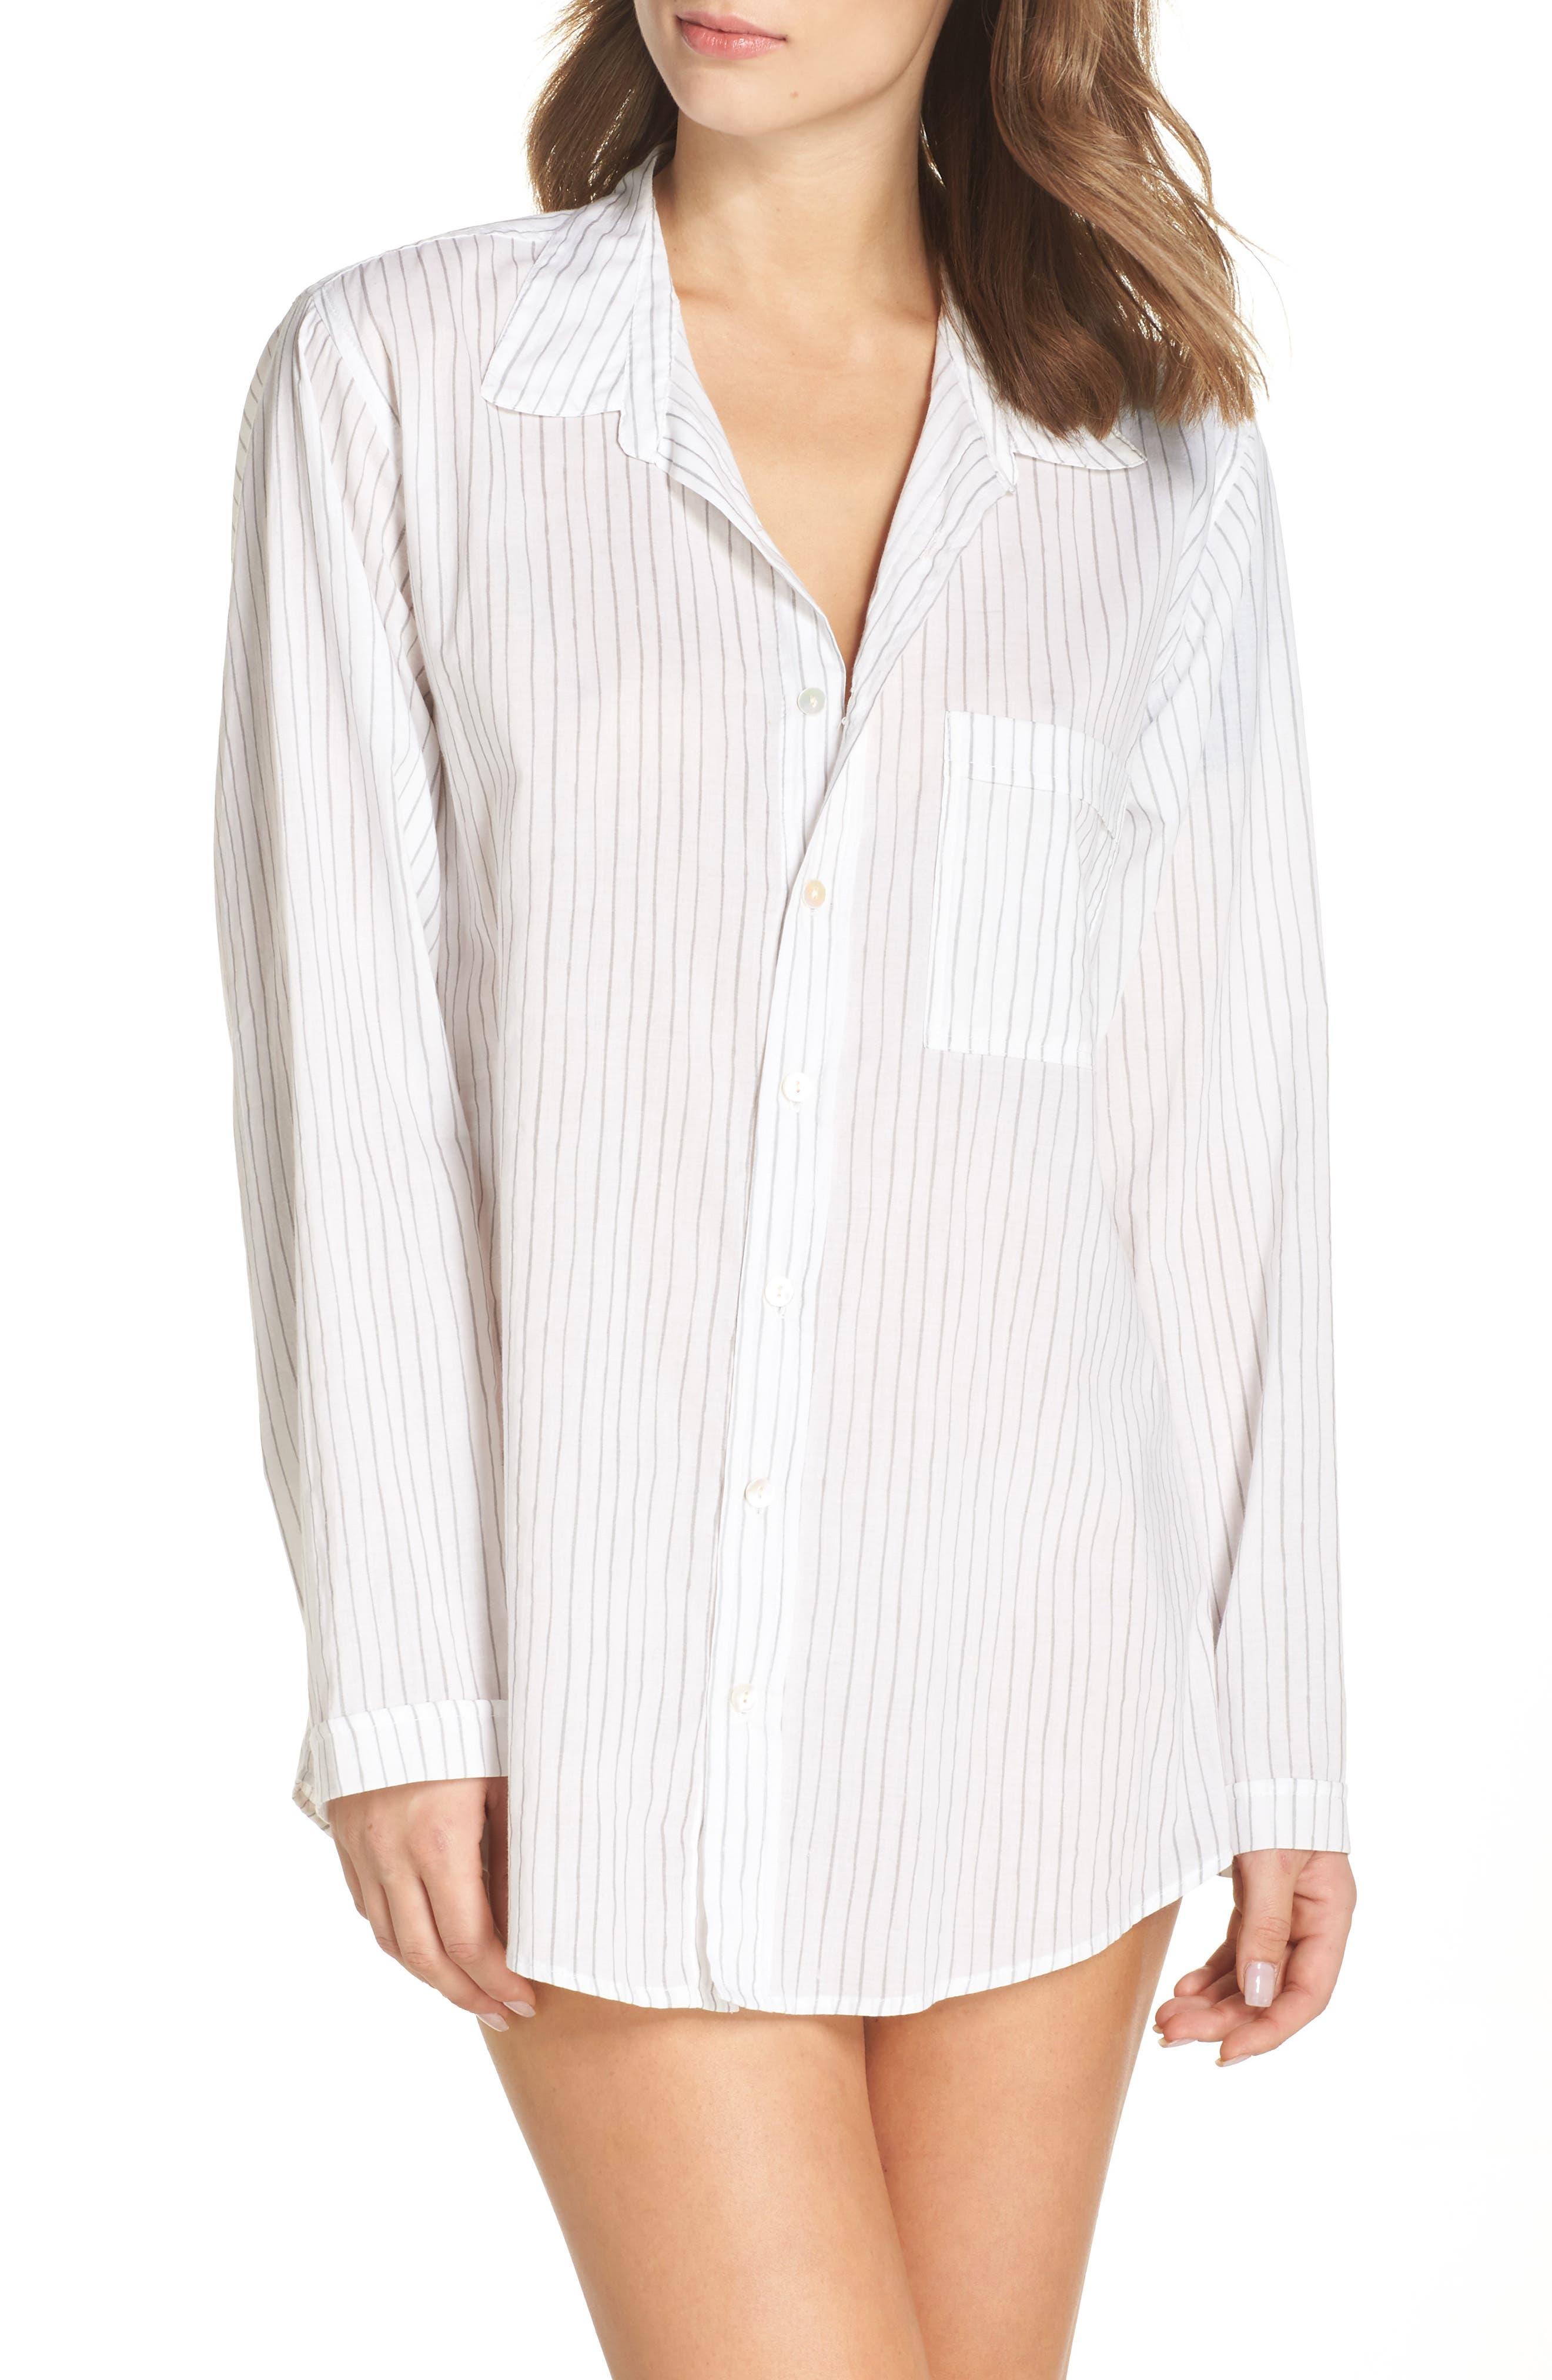 Alternate Image 1 Selected - Pour Les Femmes Pinstripe Boyfriend Sleep Shirt